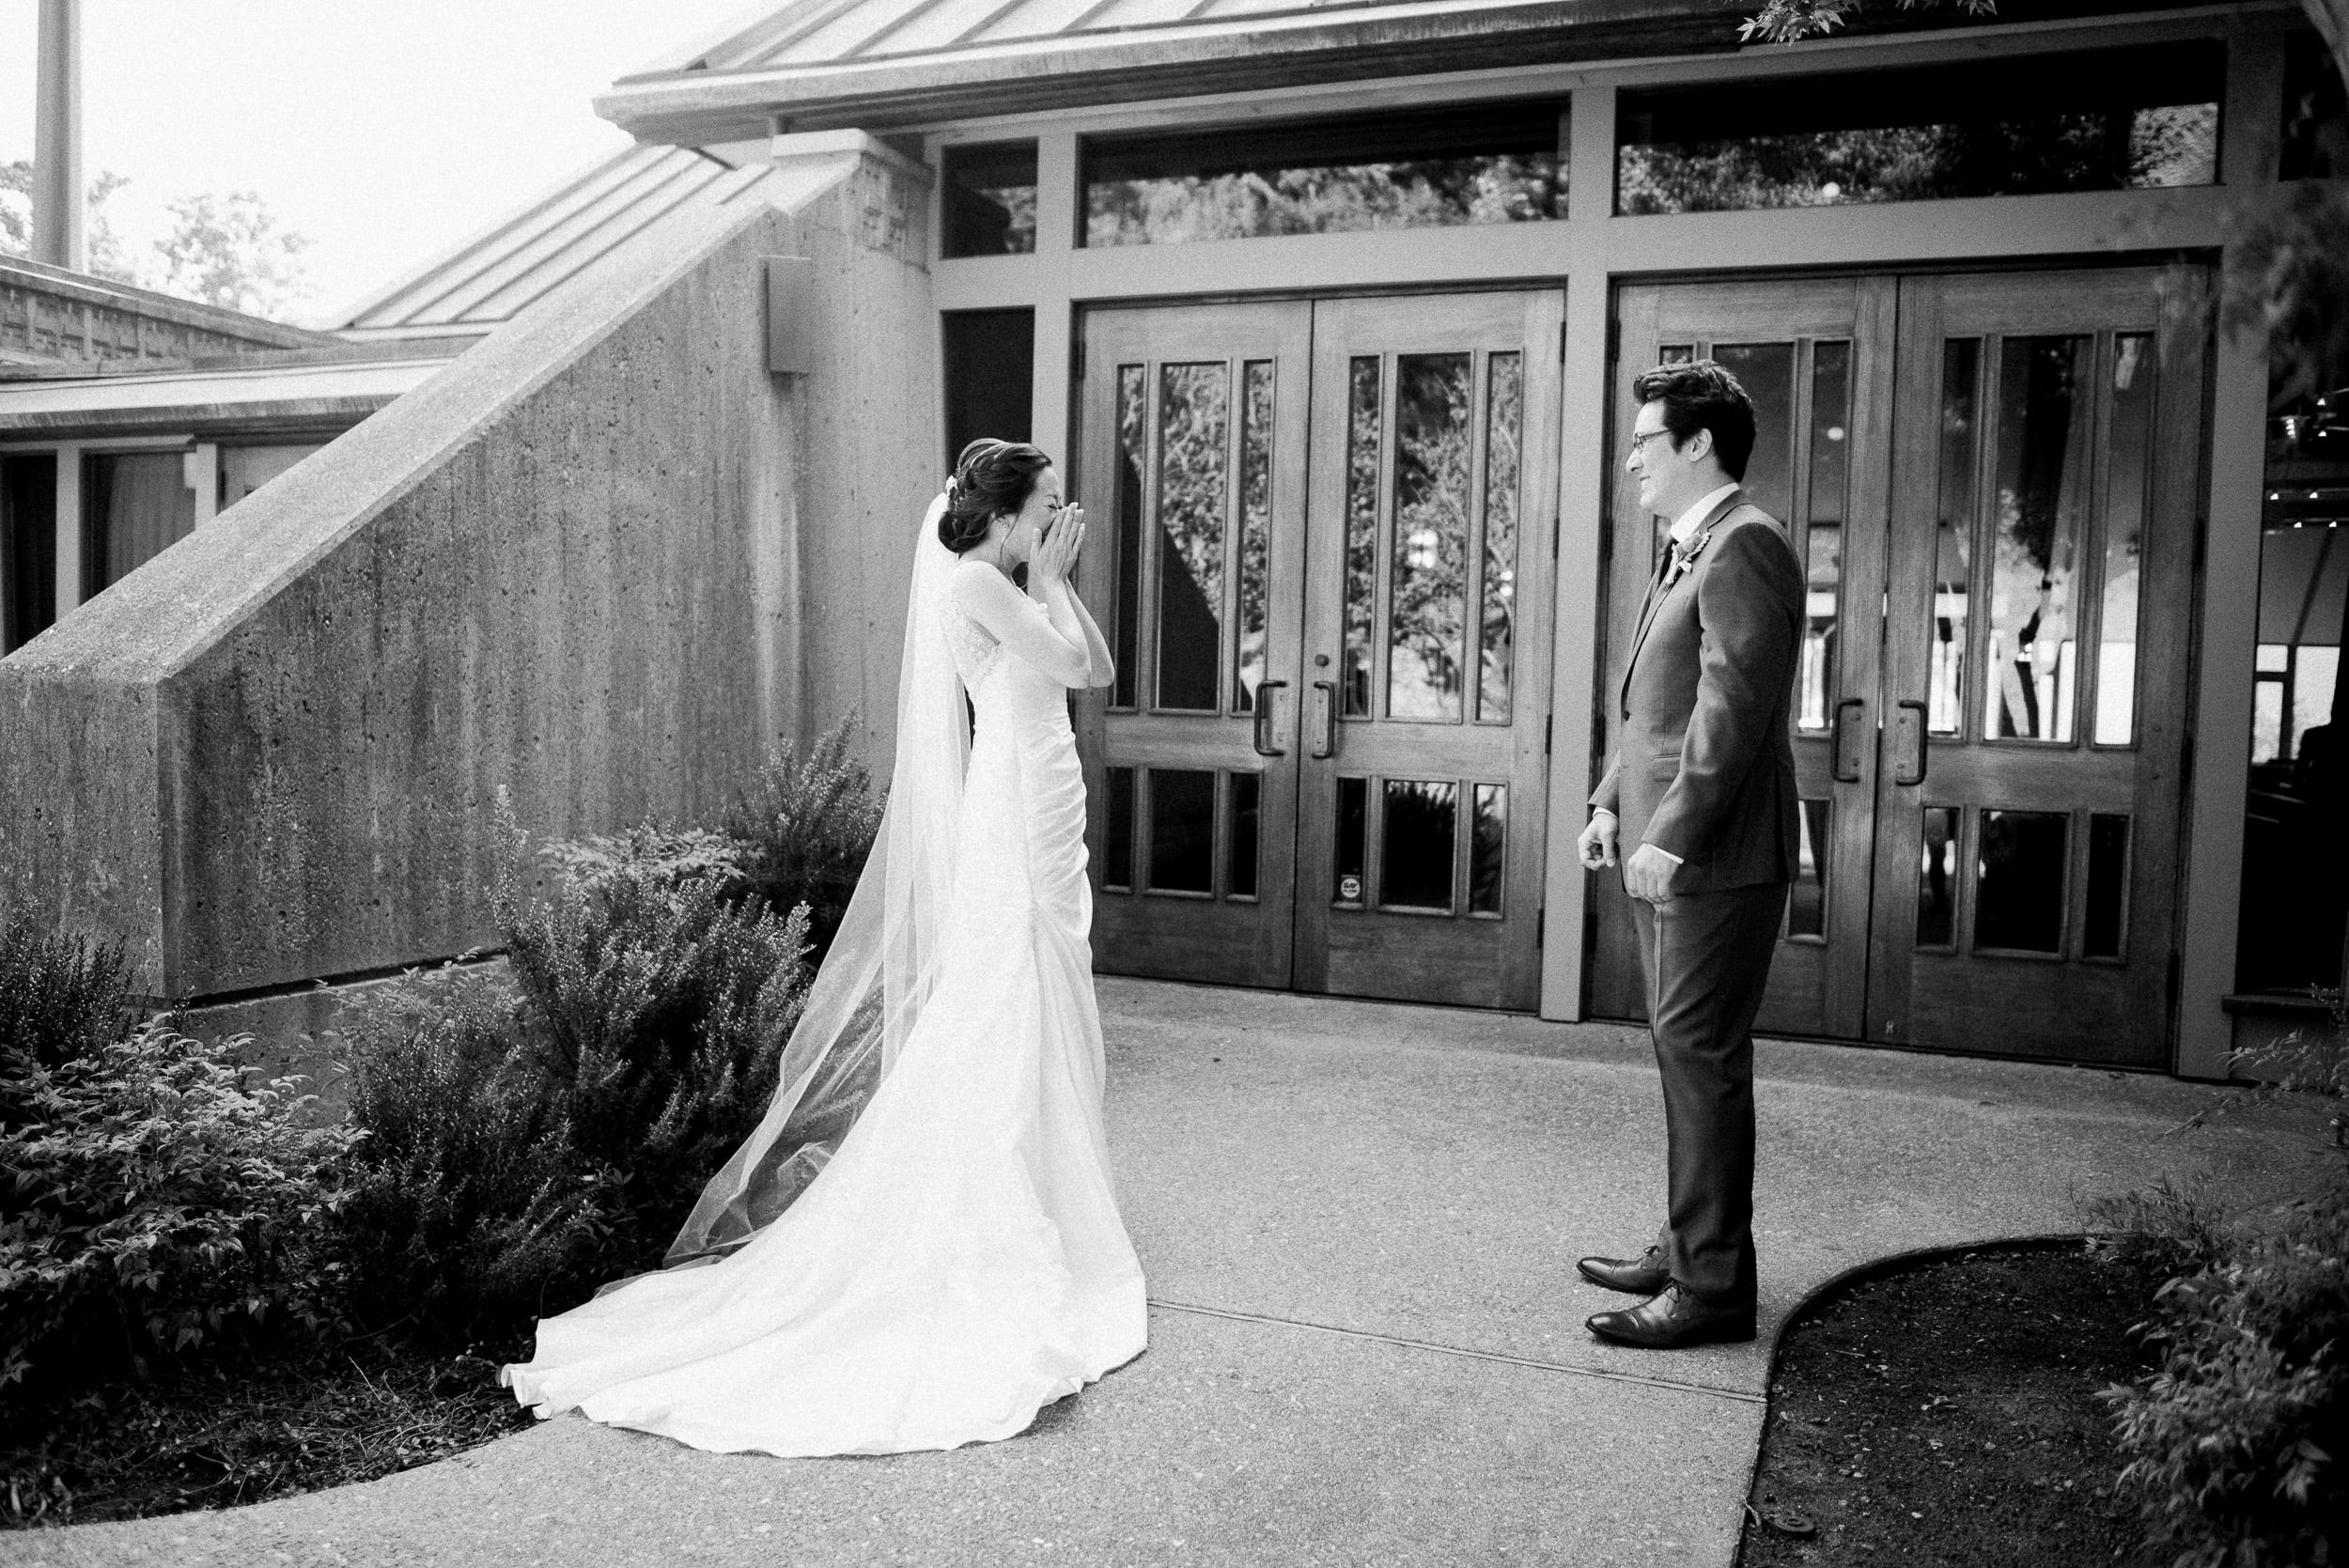 Moraga Valley Church wedding 006.jpg